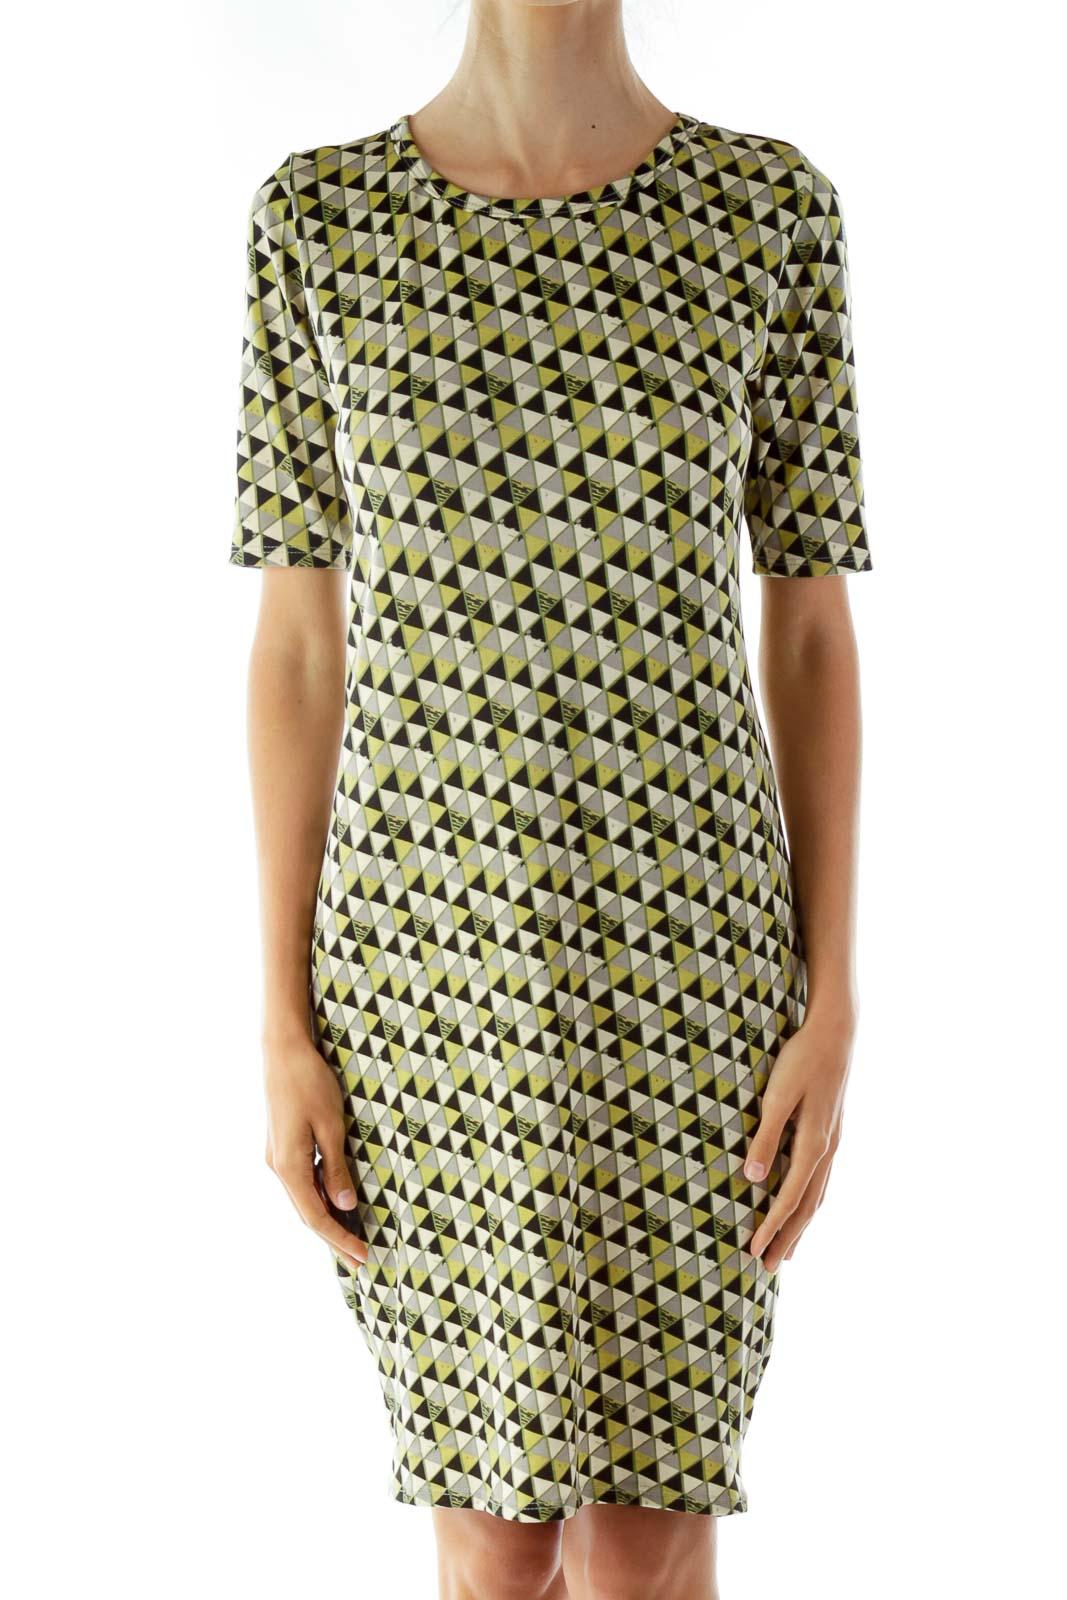 Black and Green Print T-Shirt Dress Front